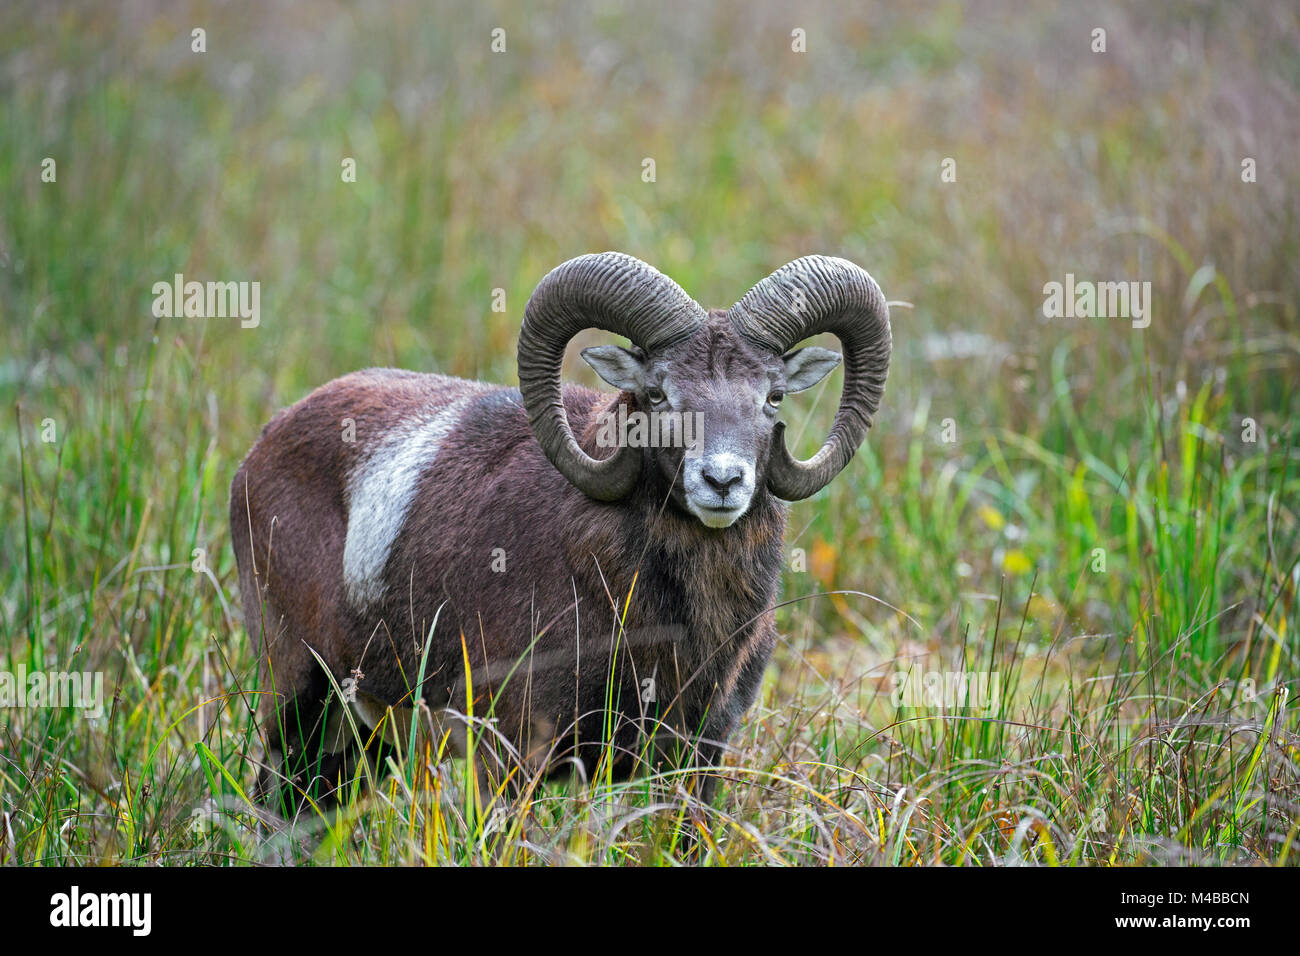 El muflón europeo (Ovis musimon gmelini / Ovis ammon / Ovis orientalis musimon) ram con grandes cuernos en Imagen De Stock